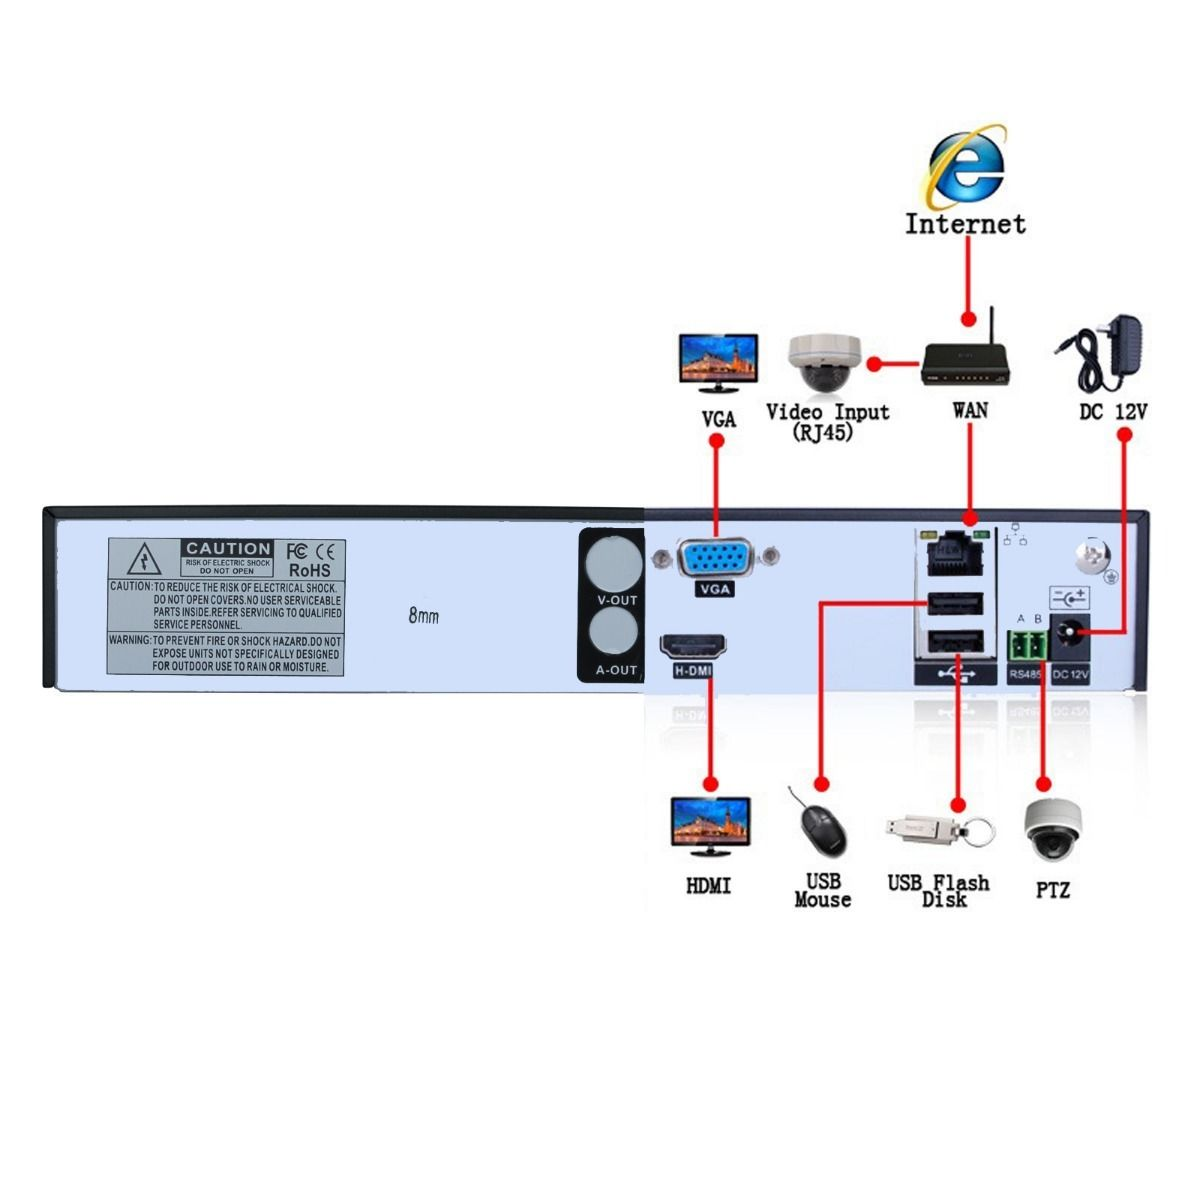 hight resolution of cat cctv wiring diagram cat image wiring diagram wiring diagram cat5 cctv images rj11 cat5 wiring